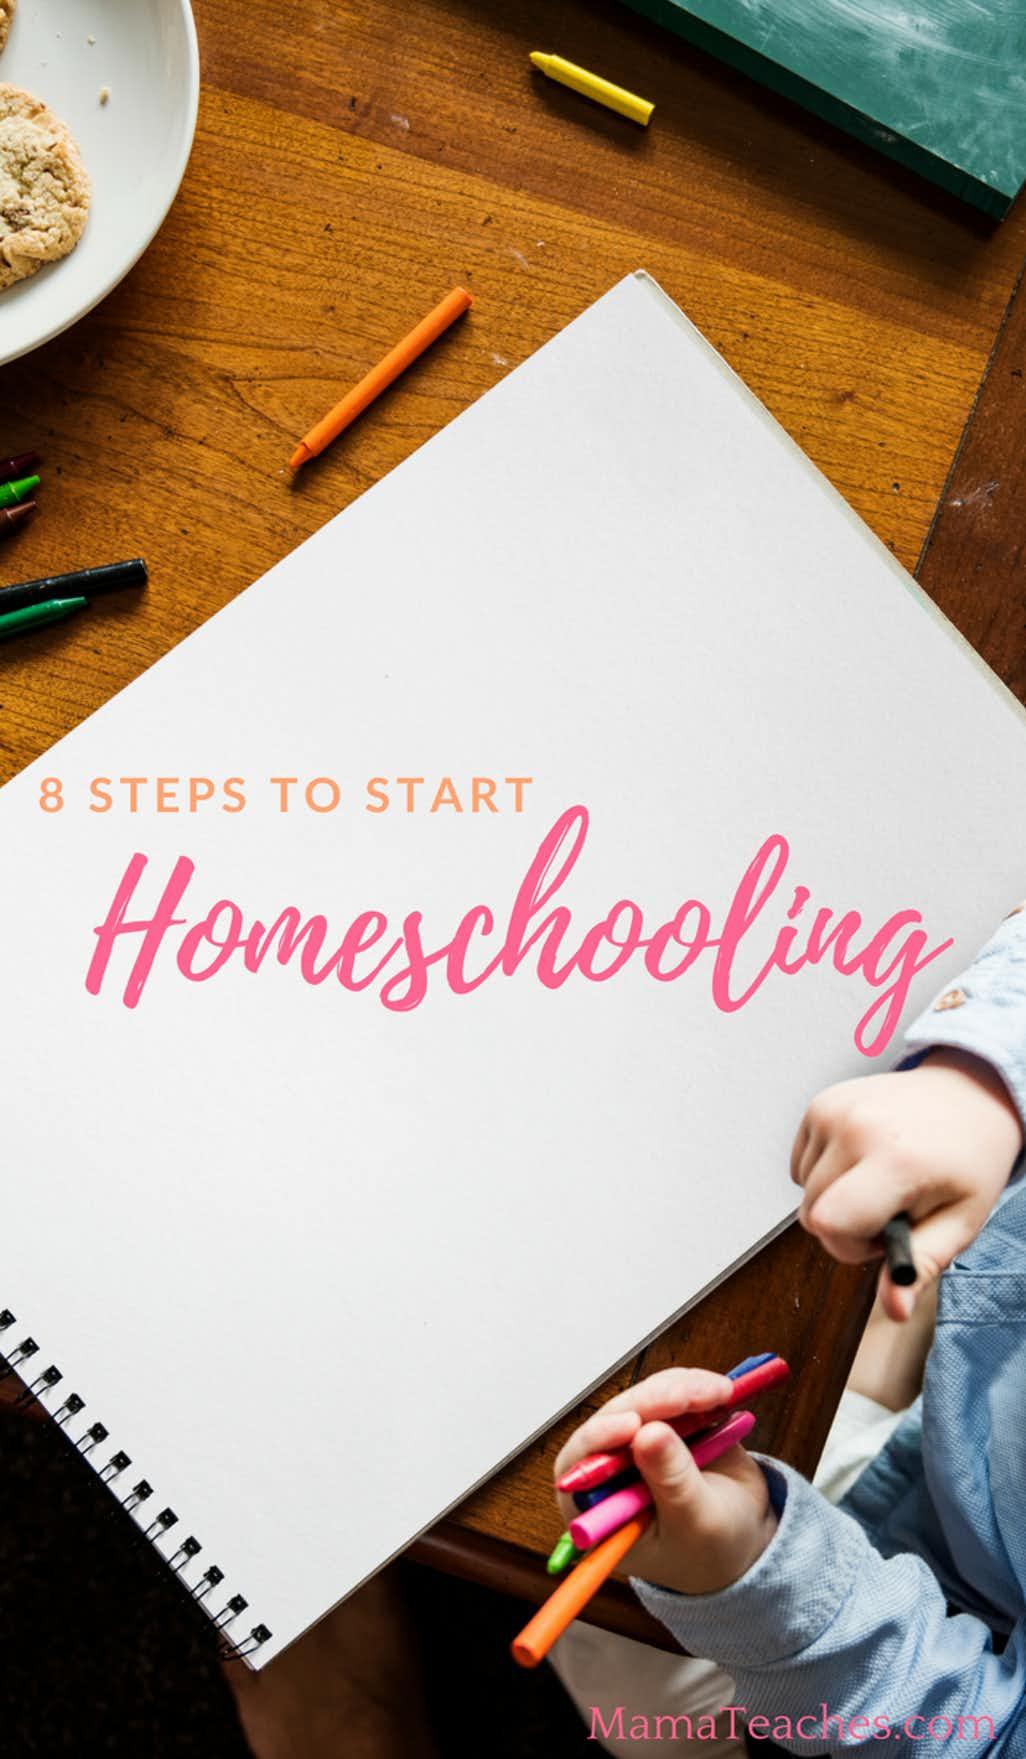 8 Steps to Start Homeschooling